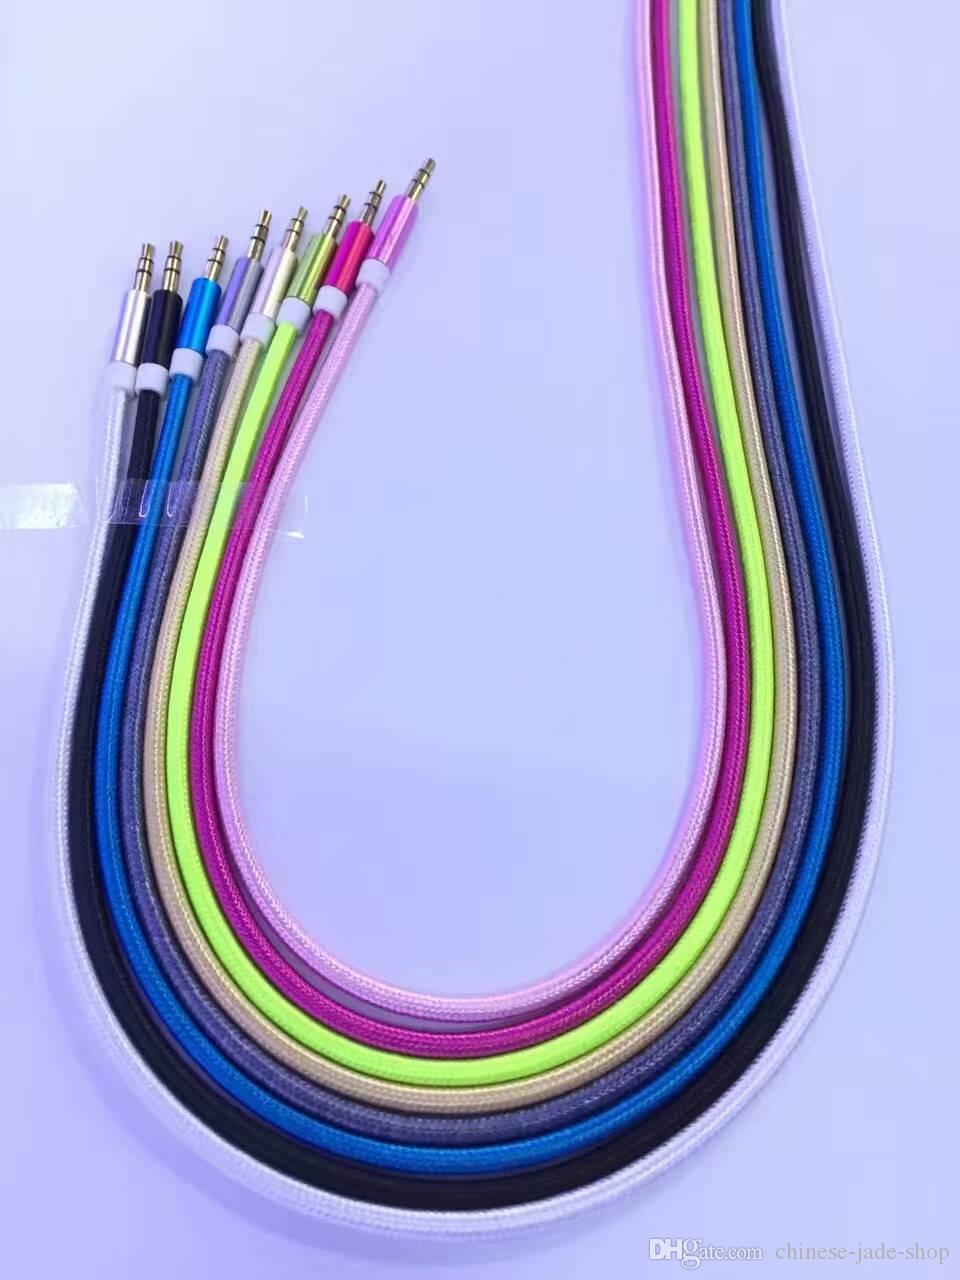 Pure kleur aluminium metalen adapter nylon gevlochten koord 3.5mm stereo audio aux kabel 1m 3ft od3.8mm /